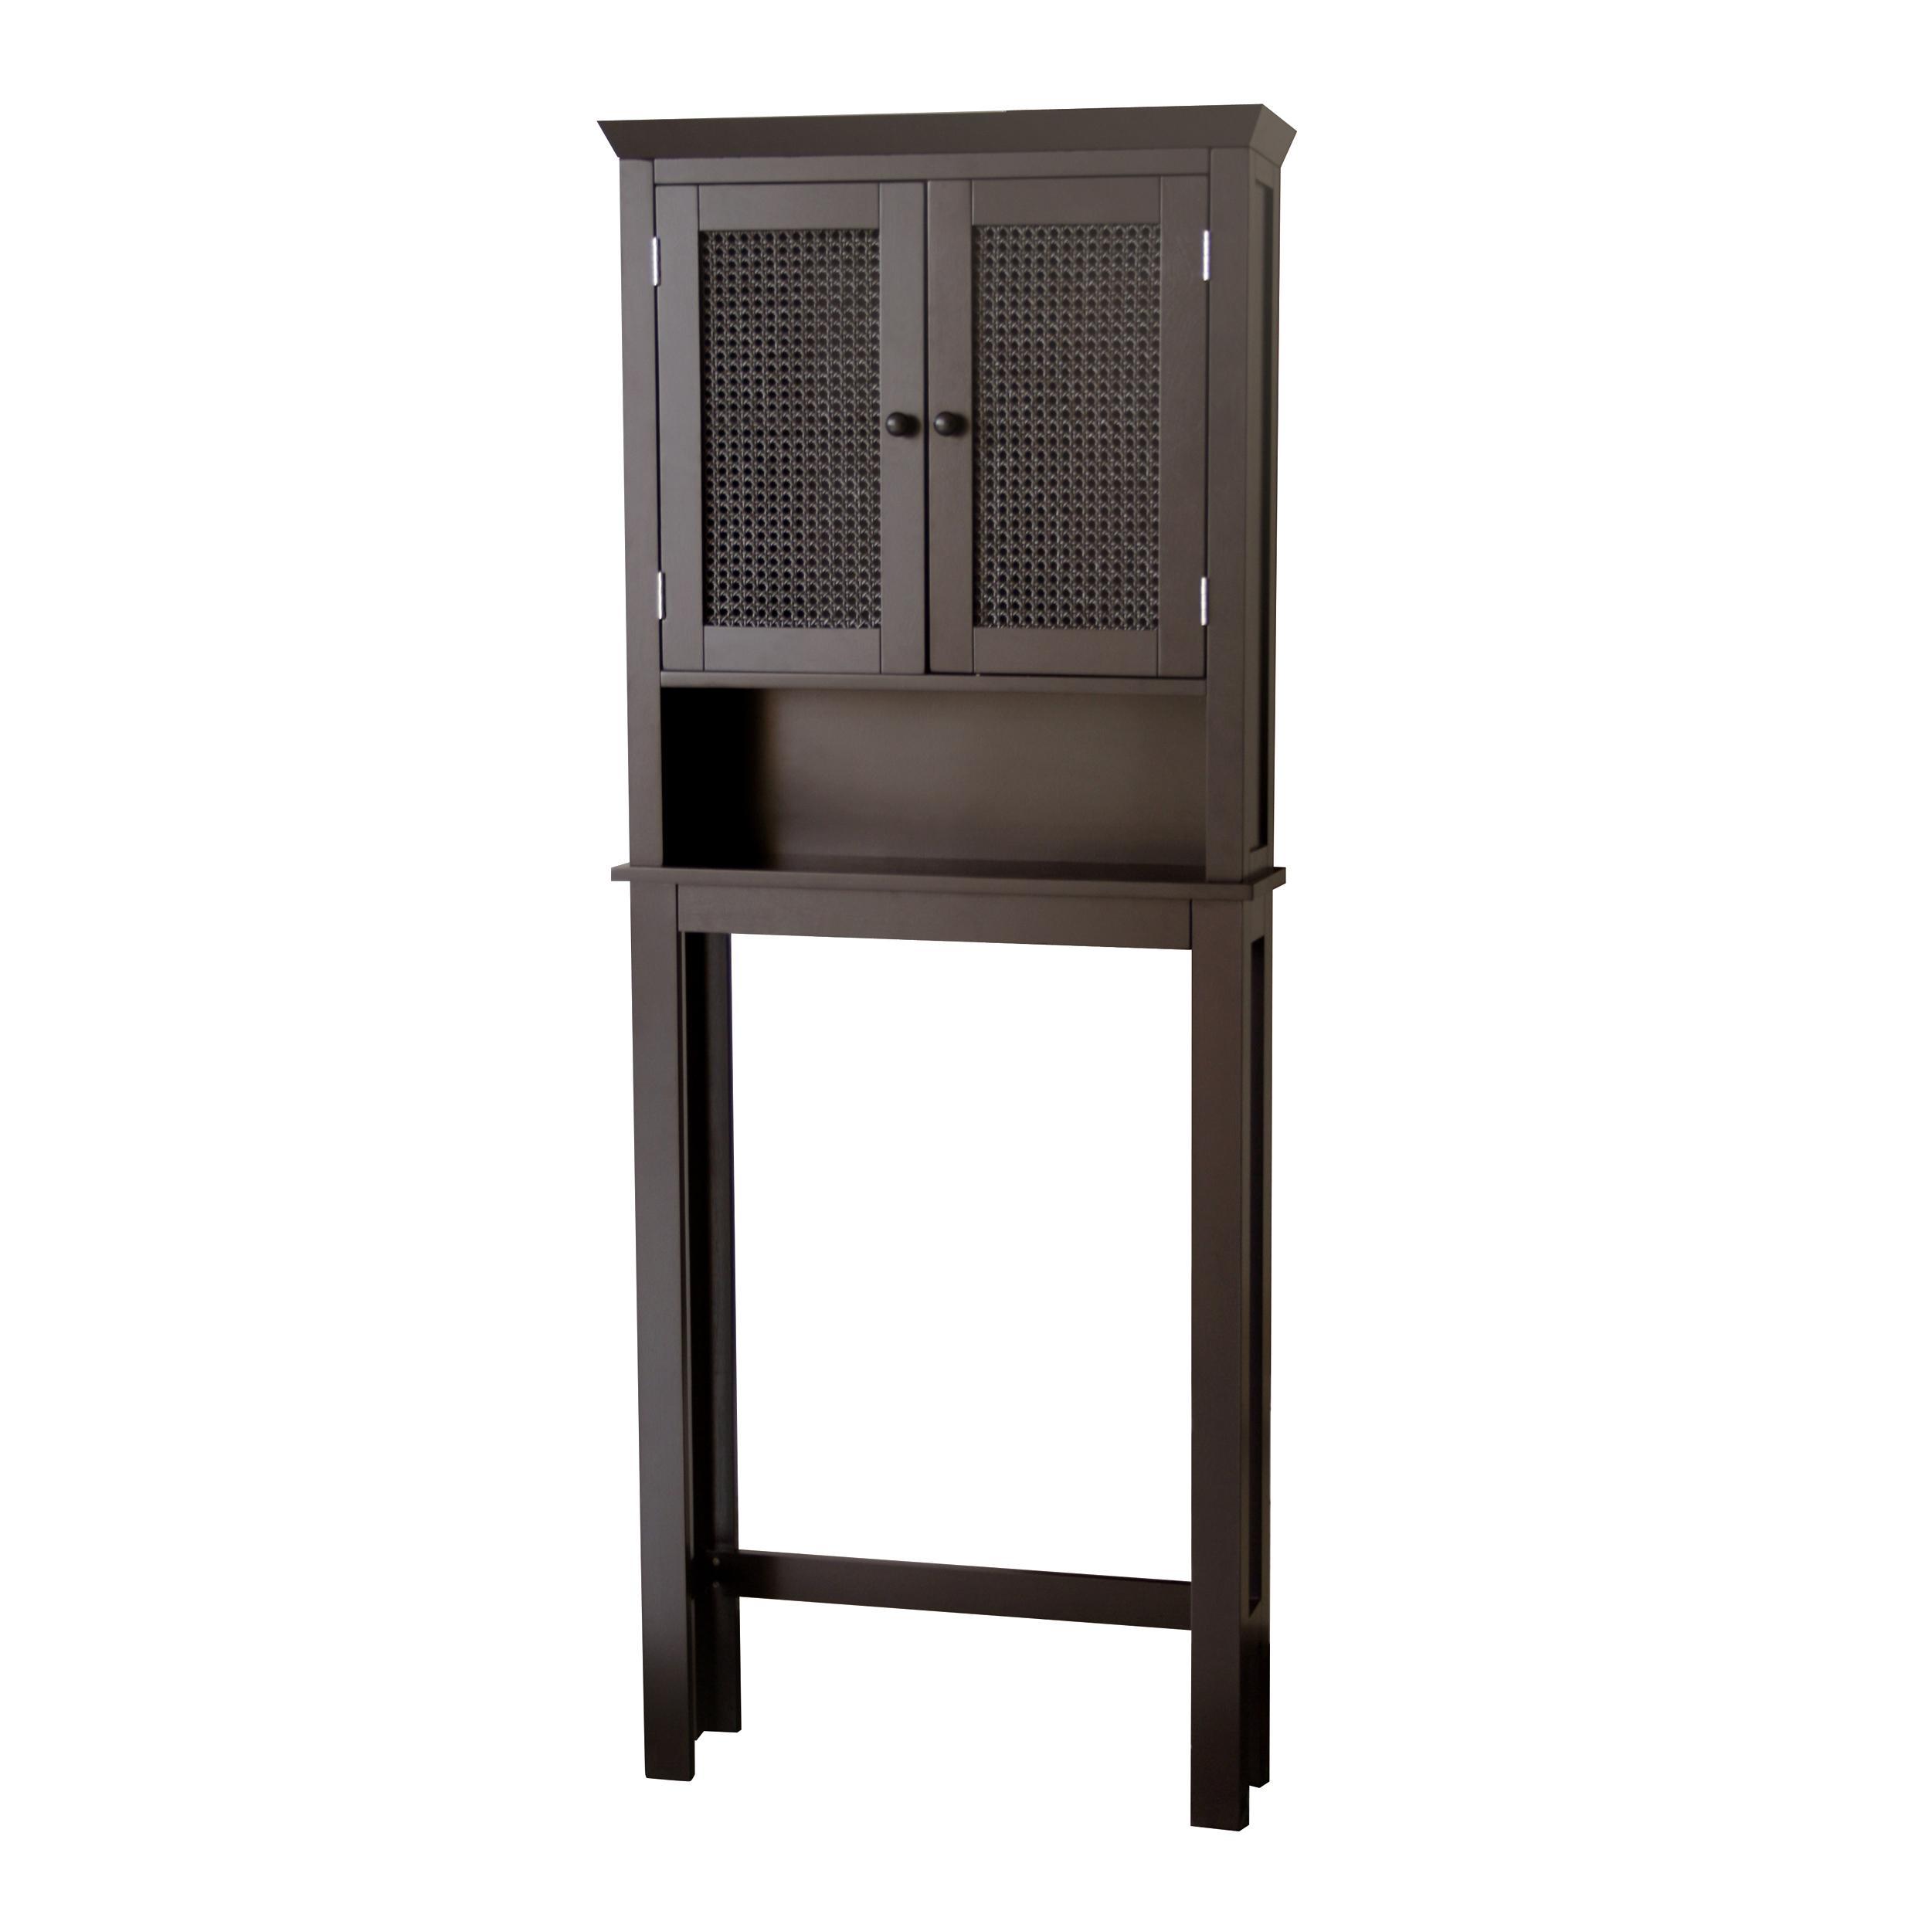 Jasper dark espresso space saver bathroom cabinet free shipping today 13434602 for Bathroom space saver cabinets